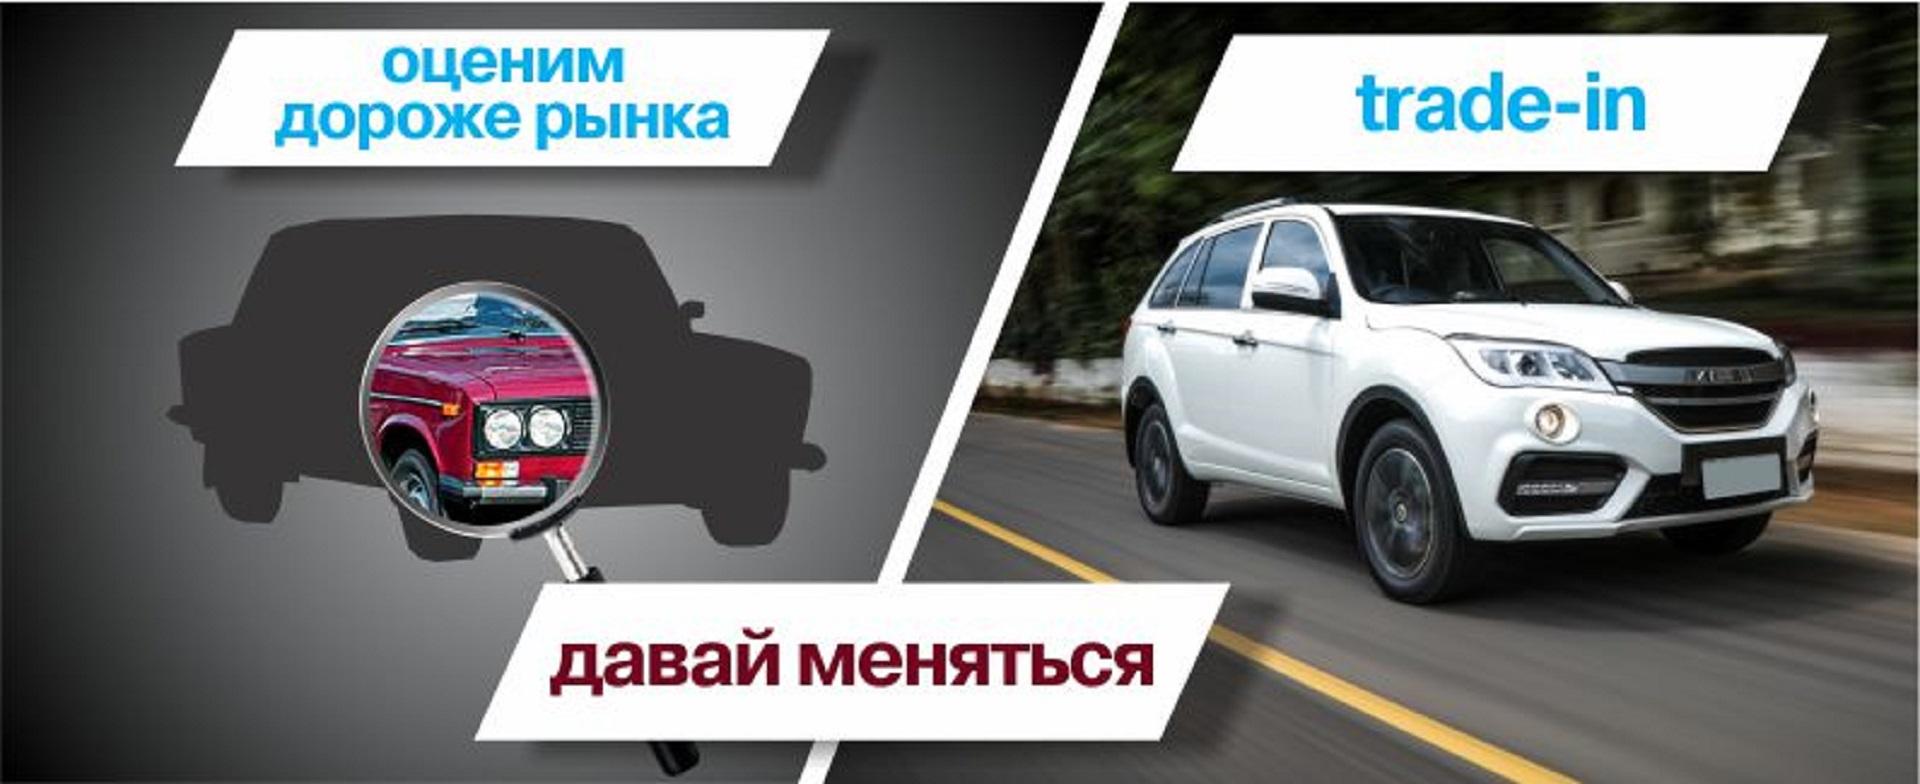 Trade-in - ОЦЕНИМ ДОРОЖЕ!!!